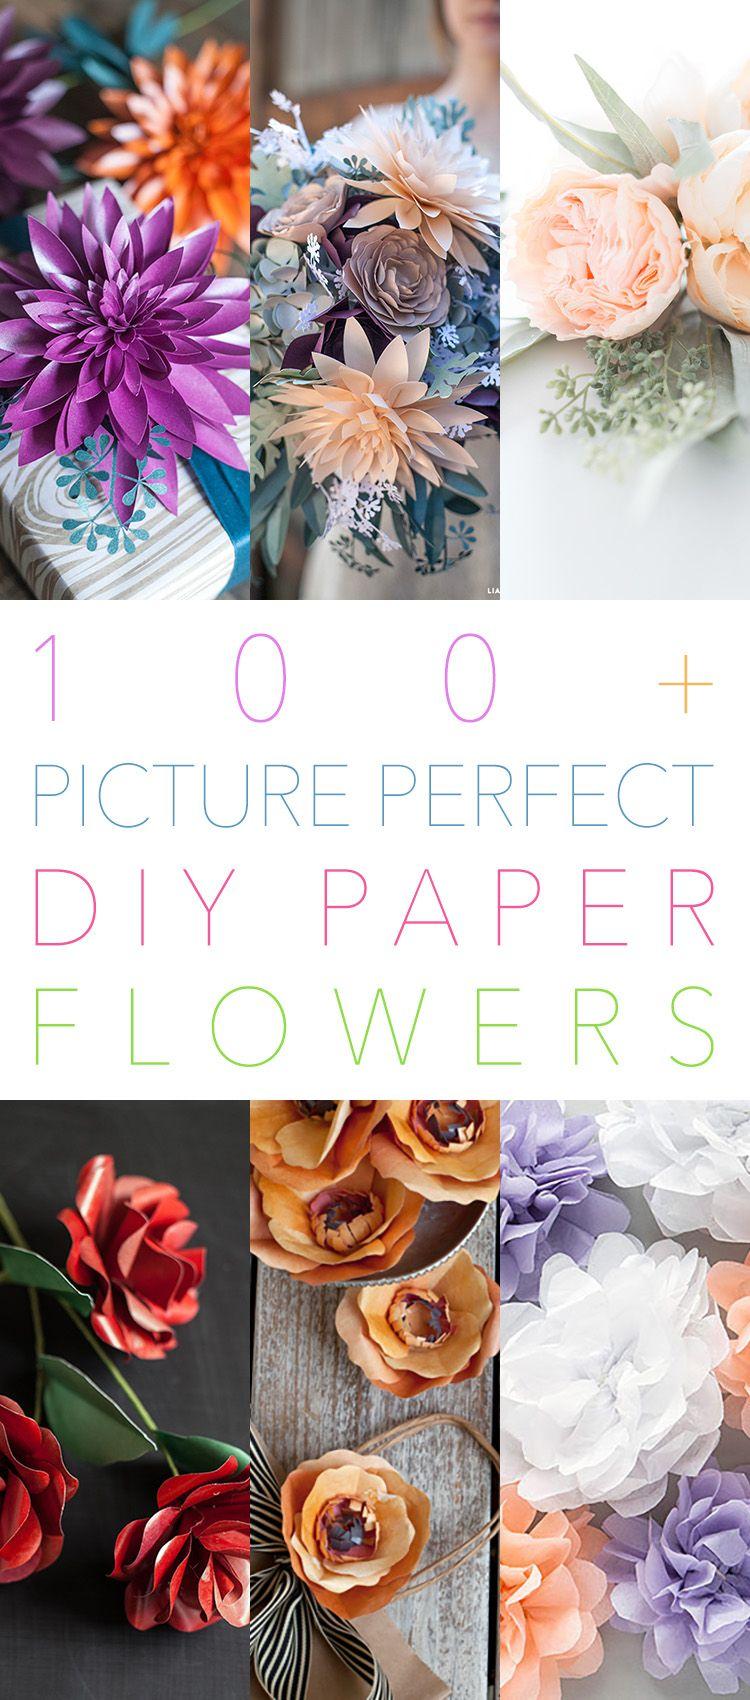 100 Picture Perfect Diy Paper Flowers Pinterest Diy Paper